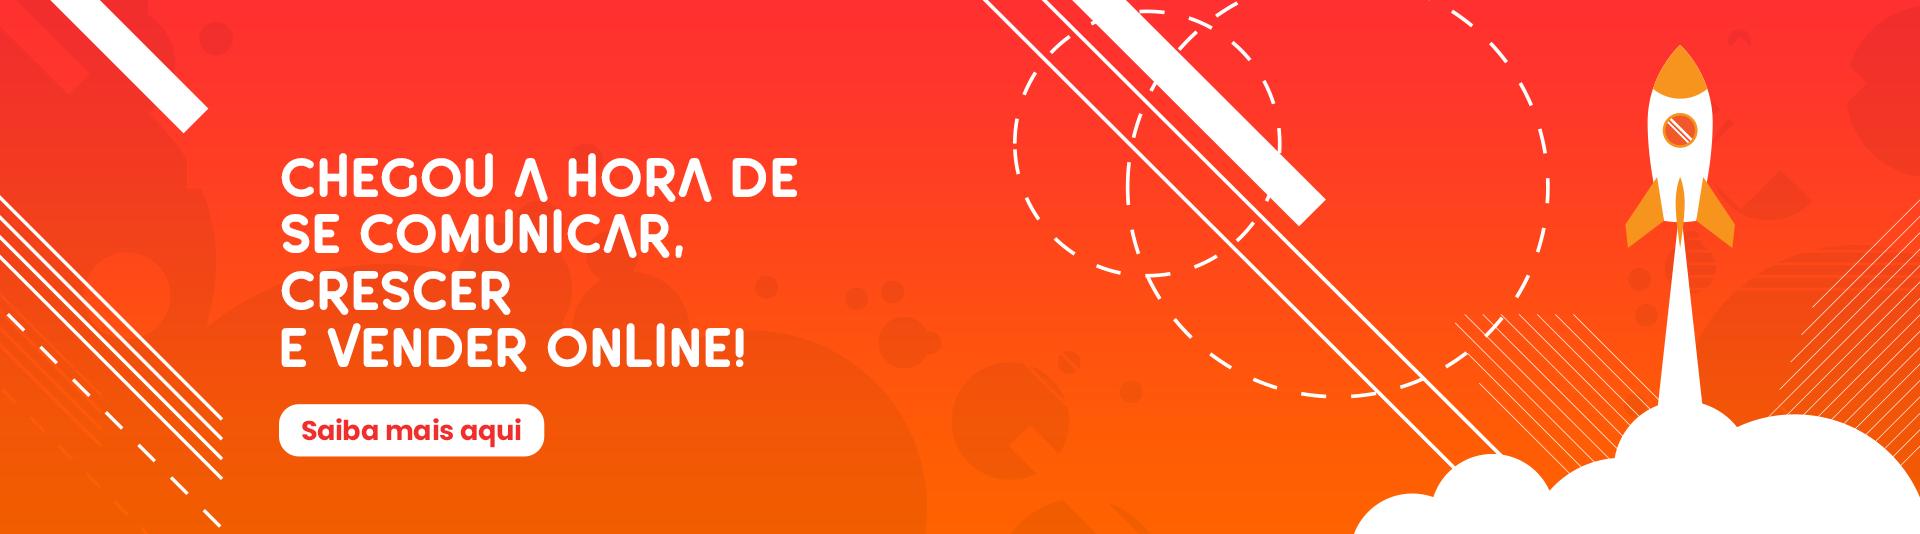 Marketing Por Assinatura Banner Principal 1